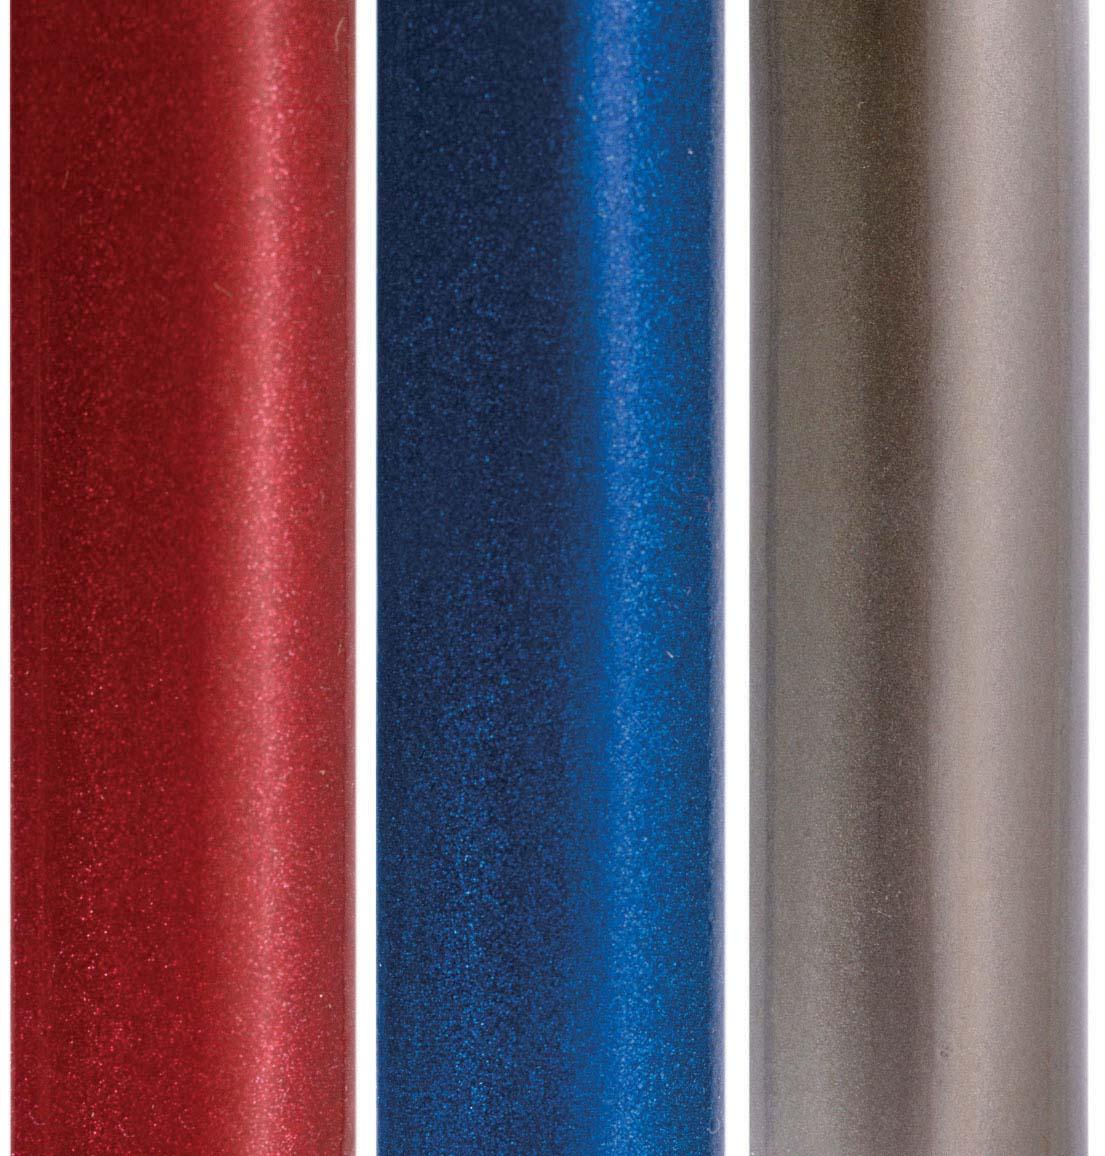 lightweight-extra-wide-heavy-duty-aluminum-rollator-titanium-501-1029-4100-lr-2.jpg